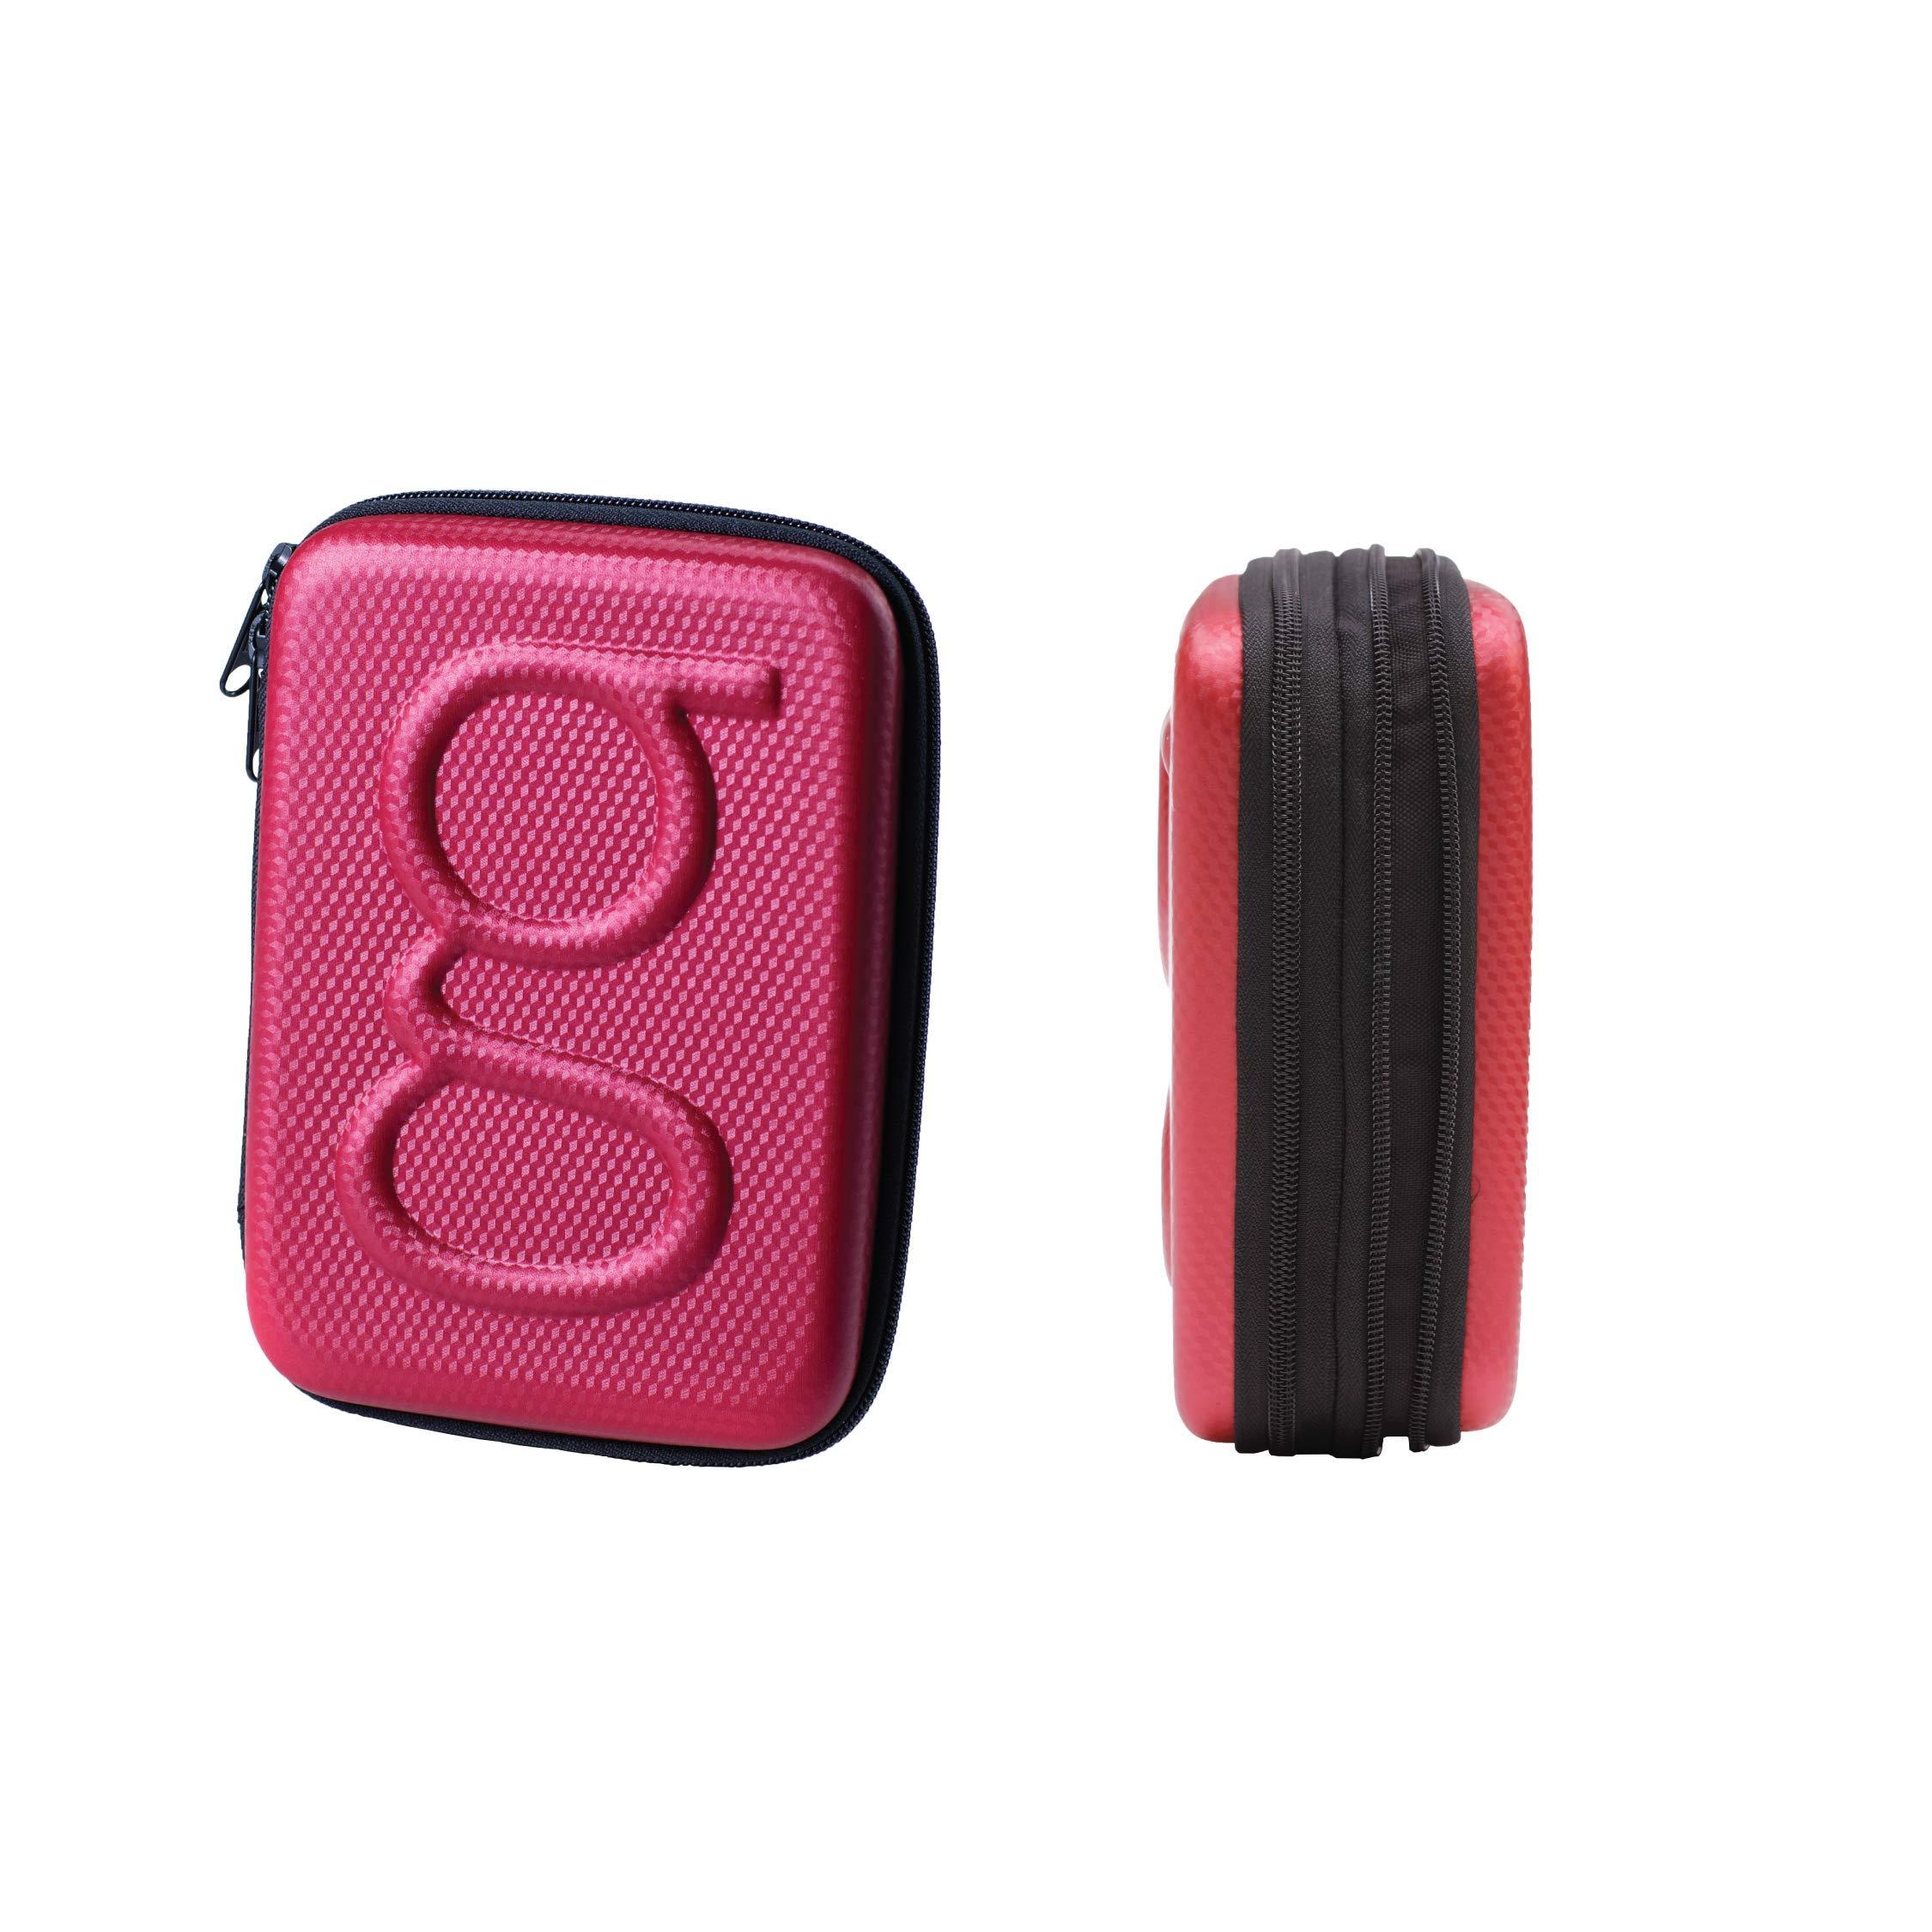 Glucology™ Diabetic Travel Case - Organizer for Blood Sugar Test Strips, Medication, Glucose Meter, Pills, Tablets, Pens, Insulin Syringes, Needles, Lancets - Hardshell Pack - Expandable, Red